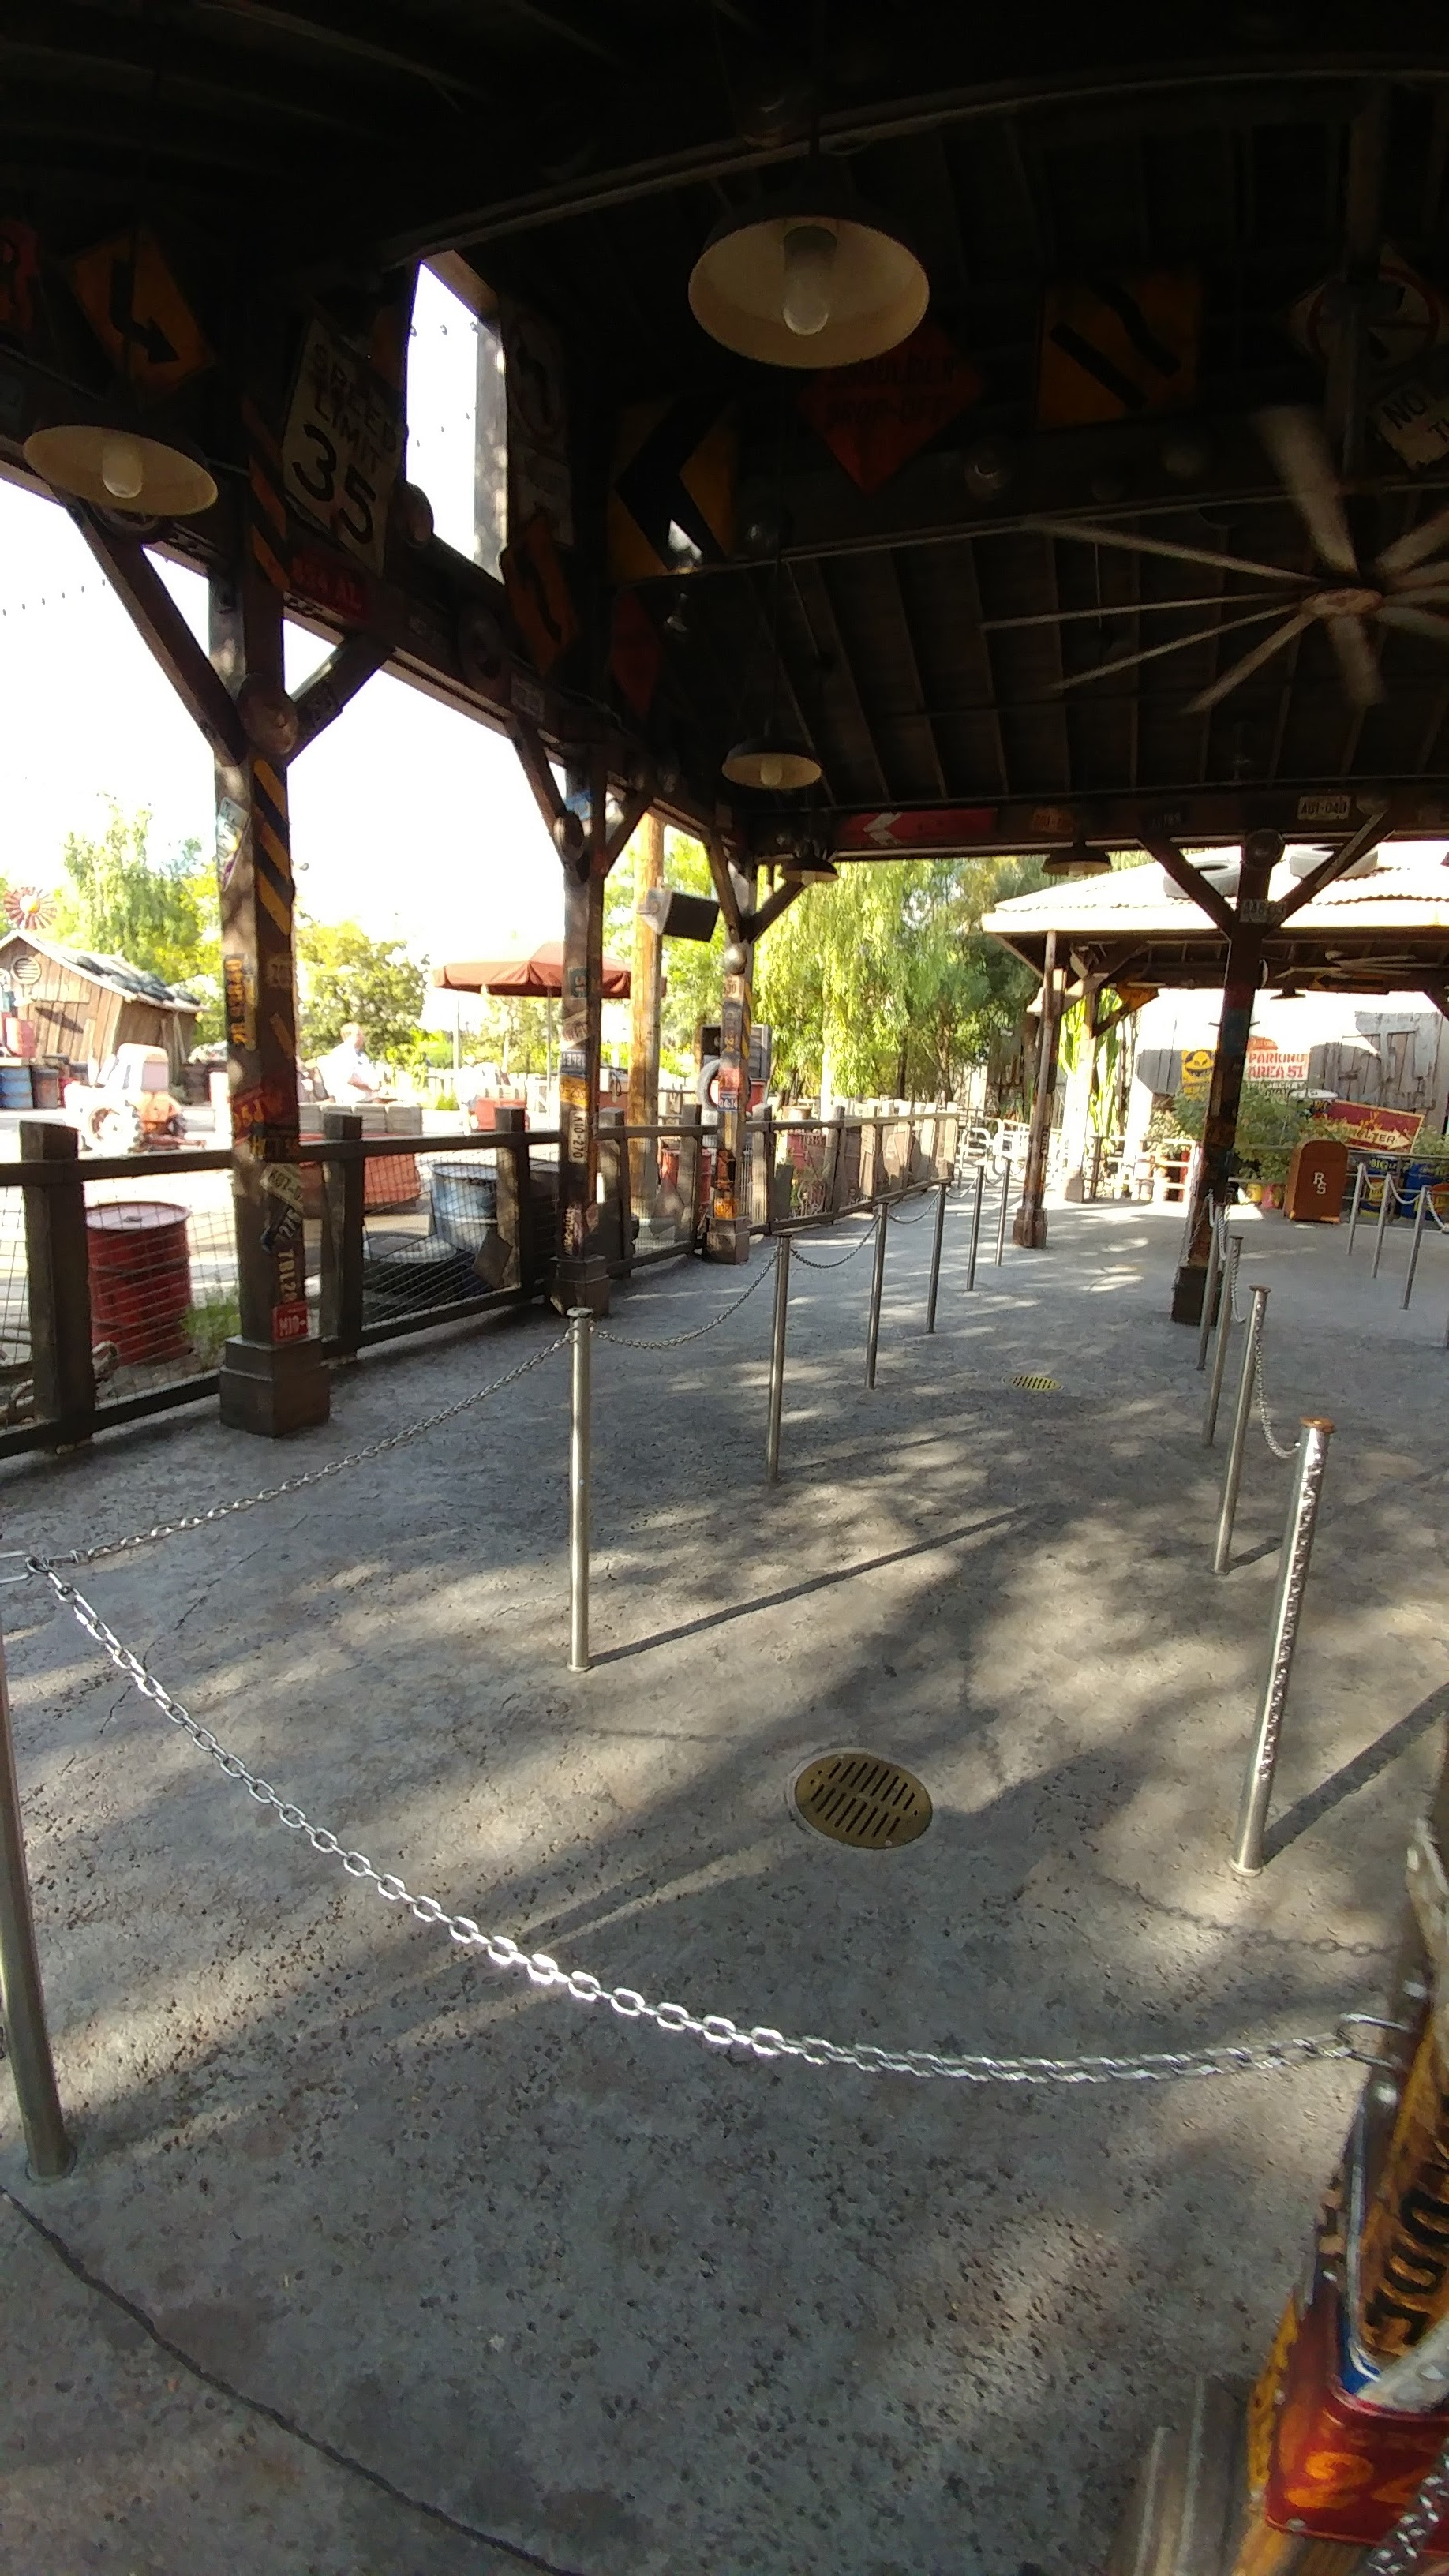 Mater's Junkyard Jamboree - Disney California Adventure